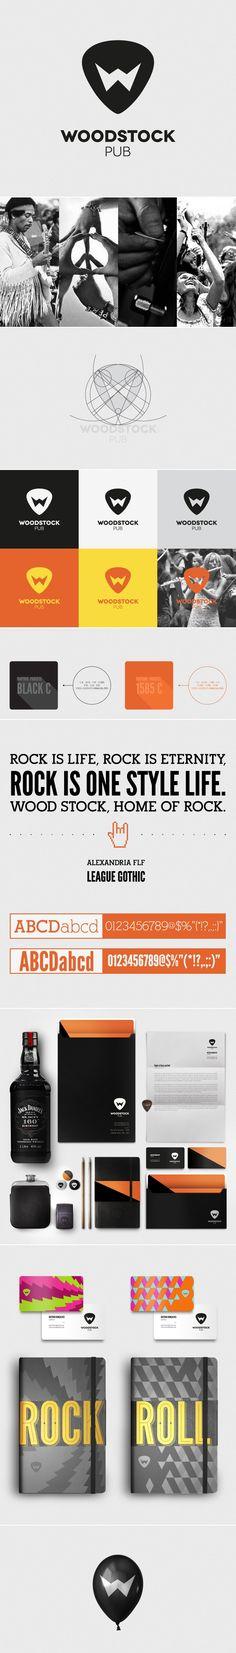 Woodstock branding - created via http://pinthemall.net